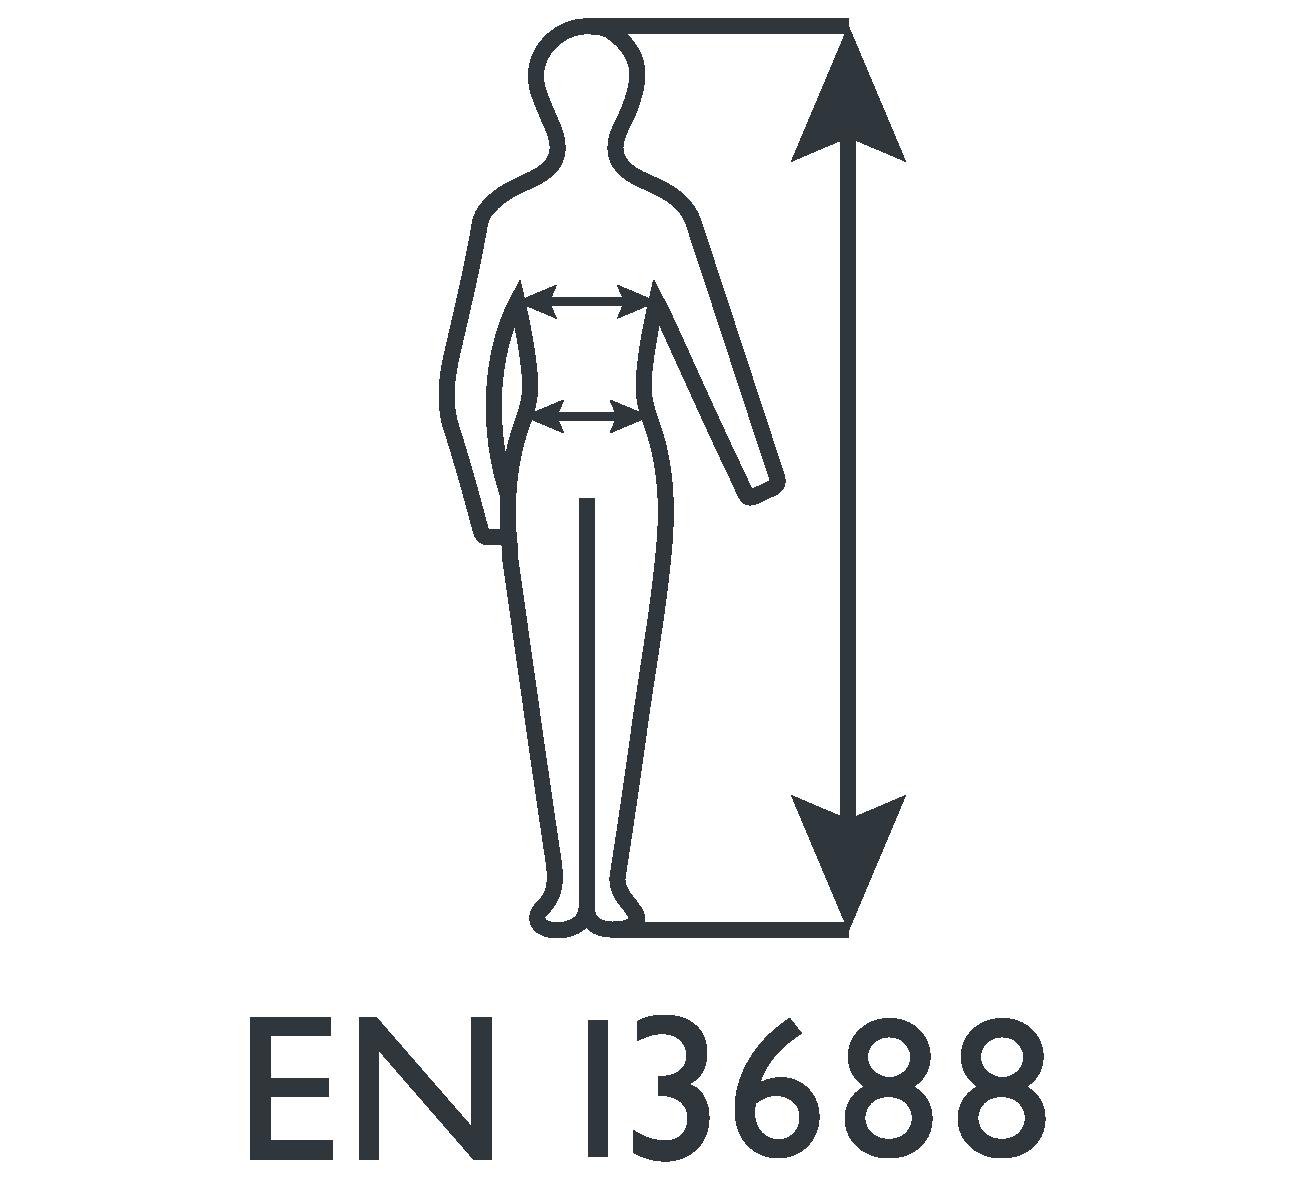 EN 13688 Minimum requirements protective clothing